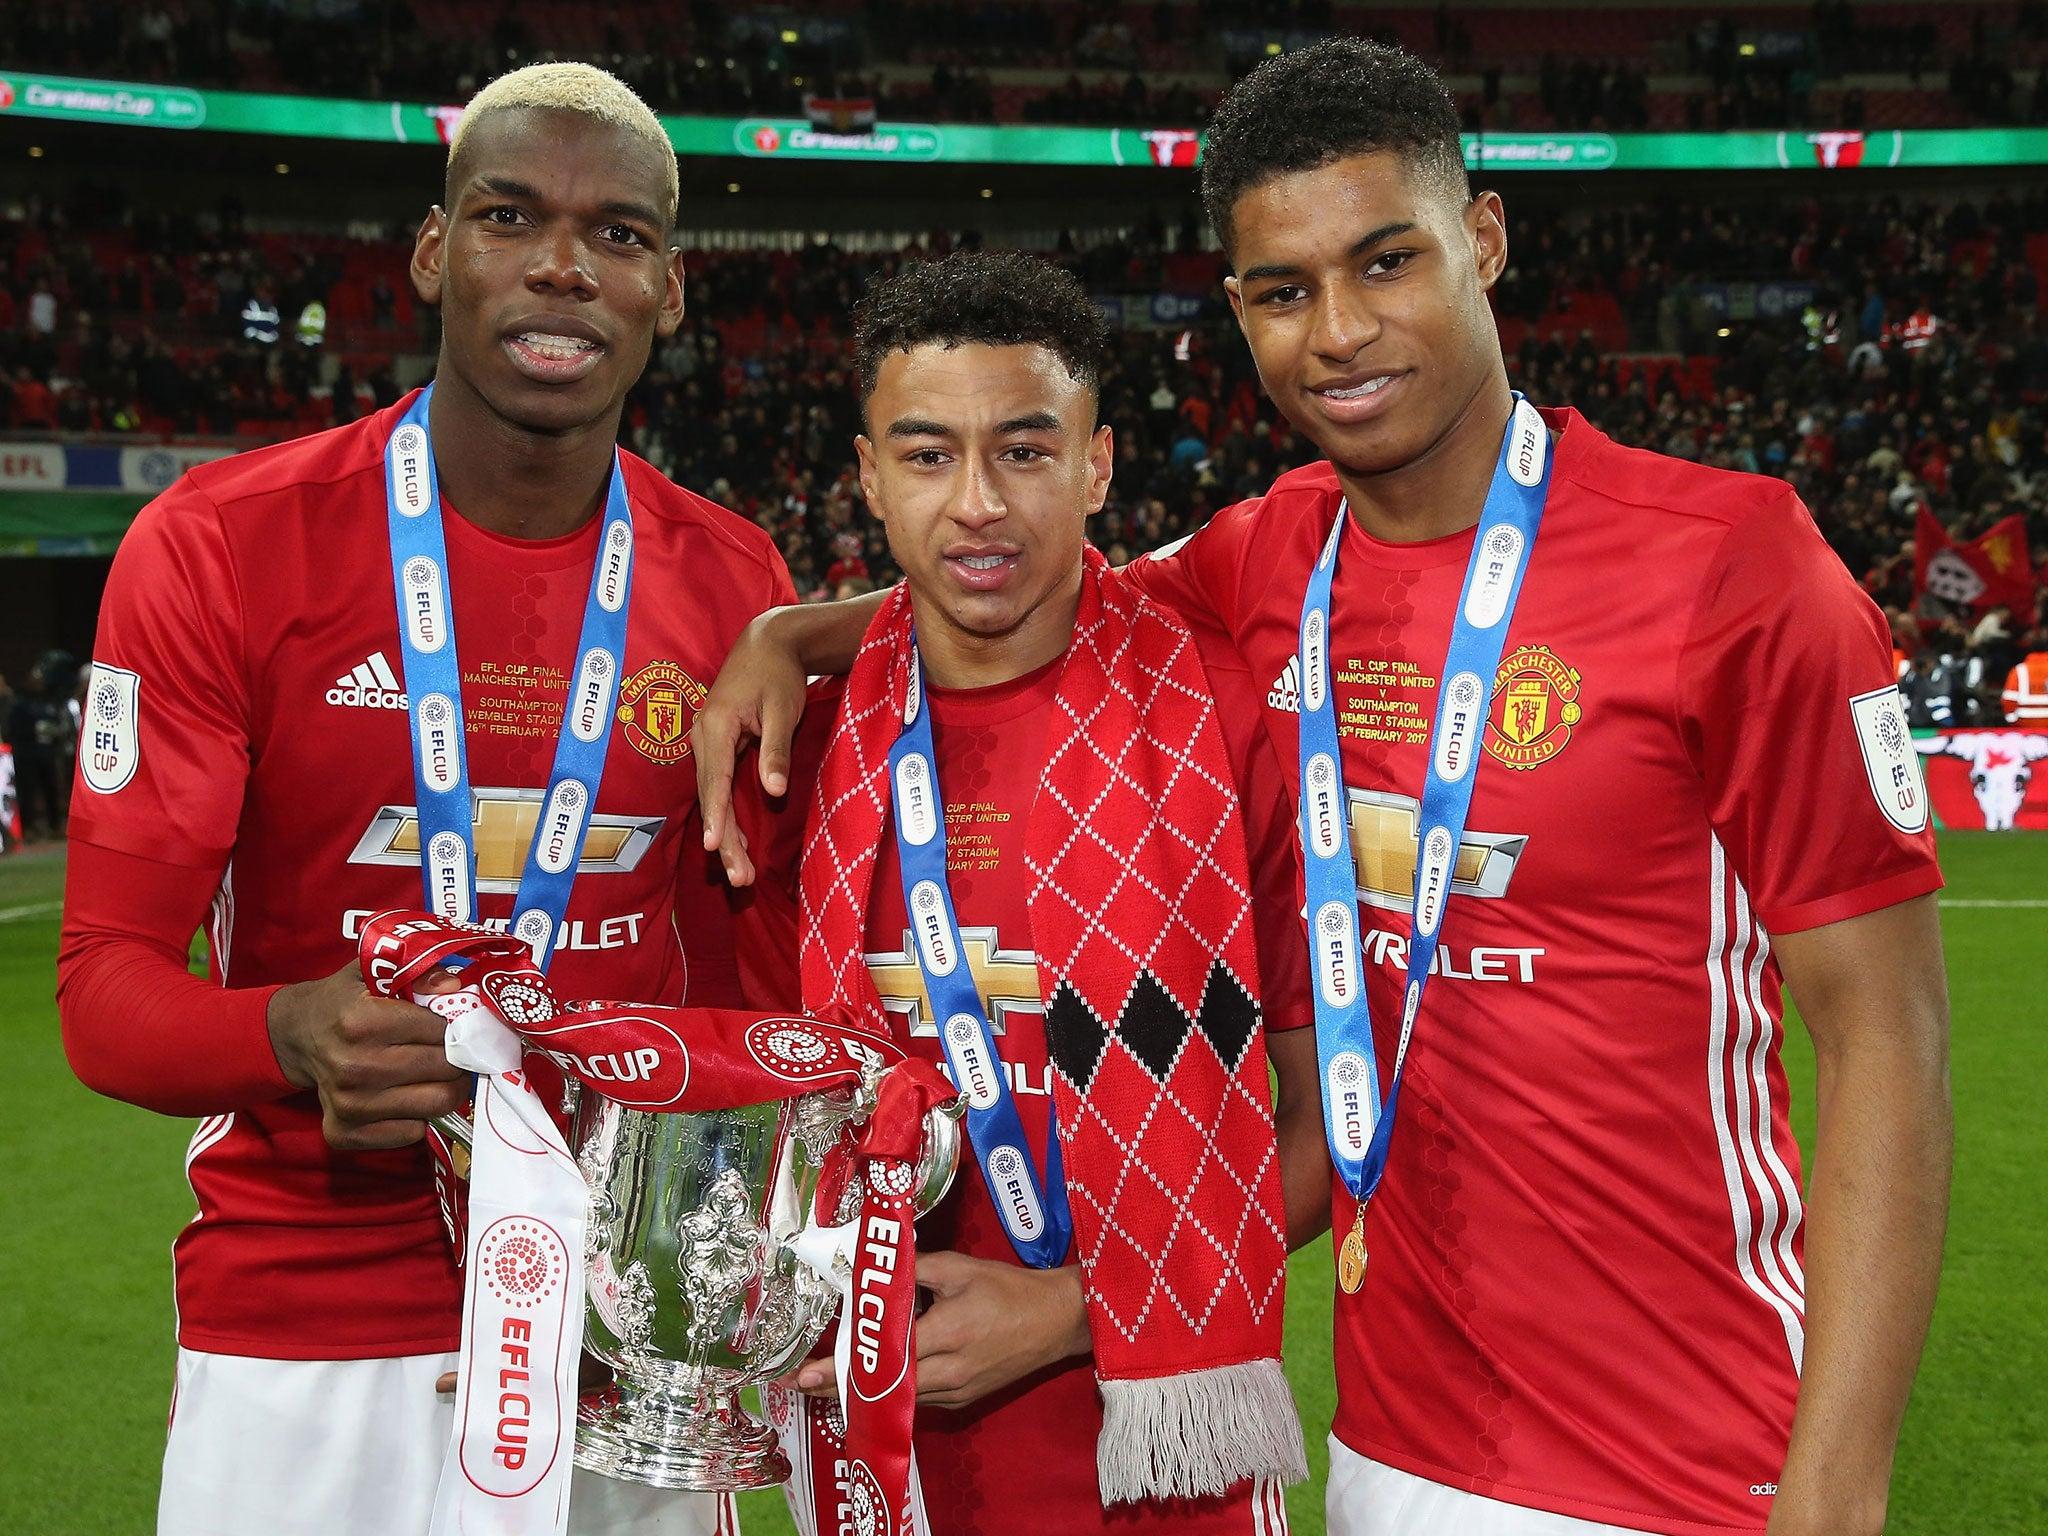 Paul Pogba, Jesse Lingard And Marcus Rashford A 'shining